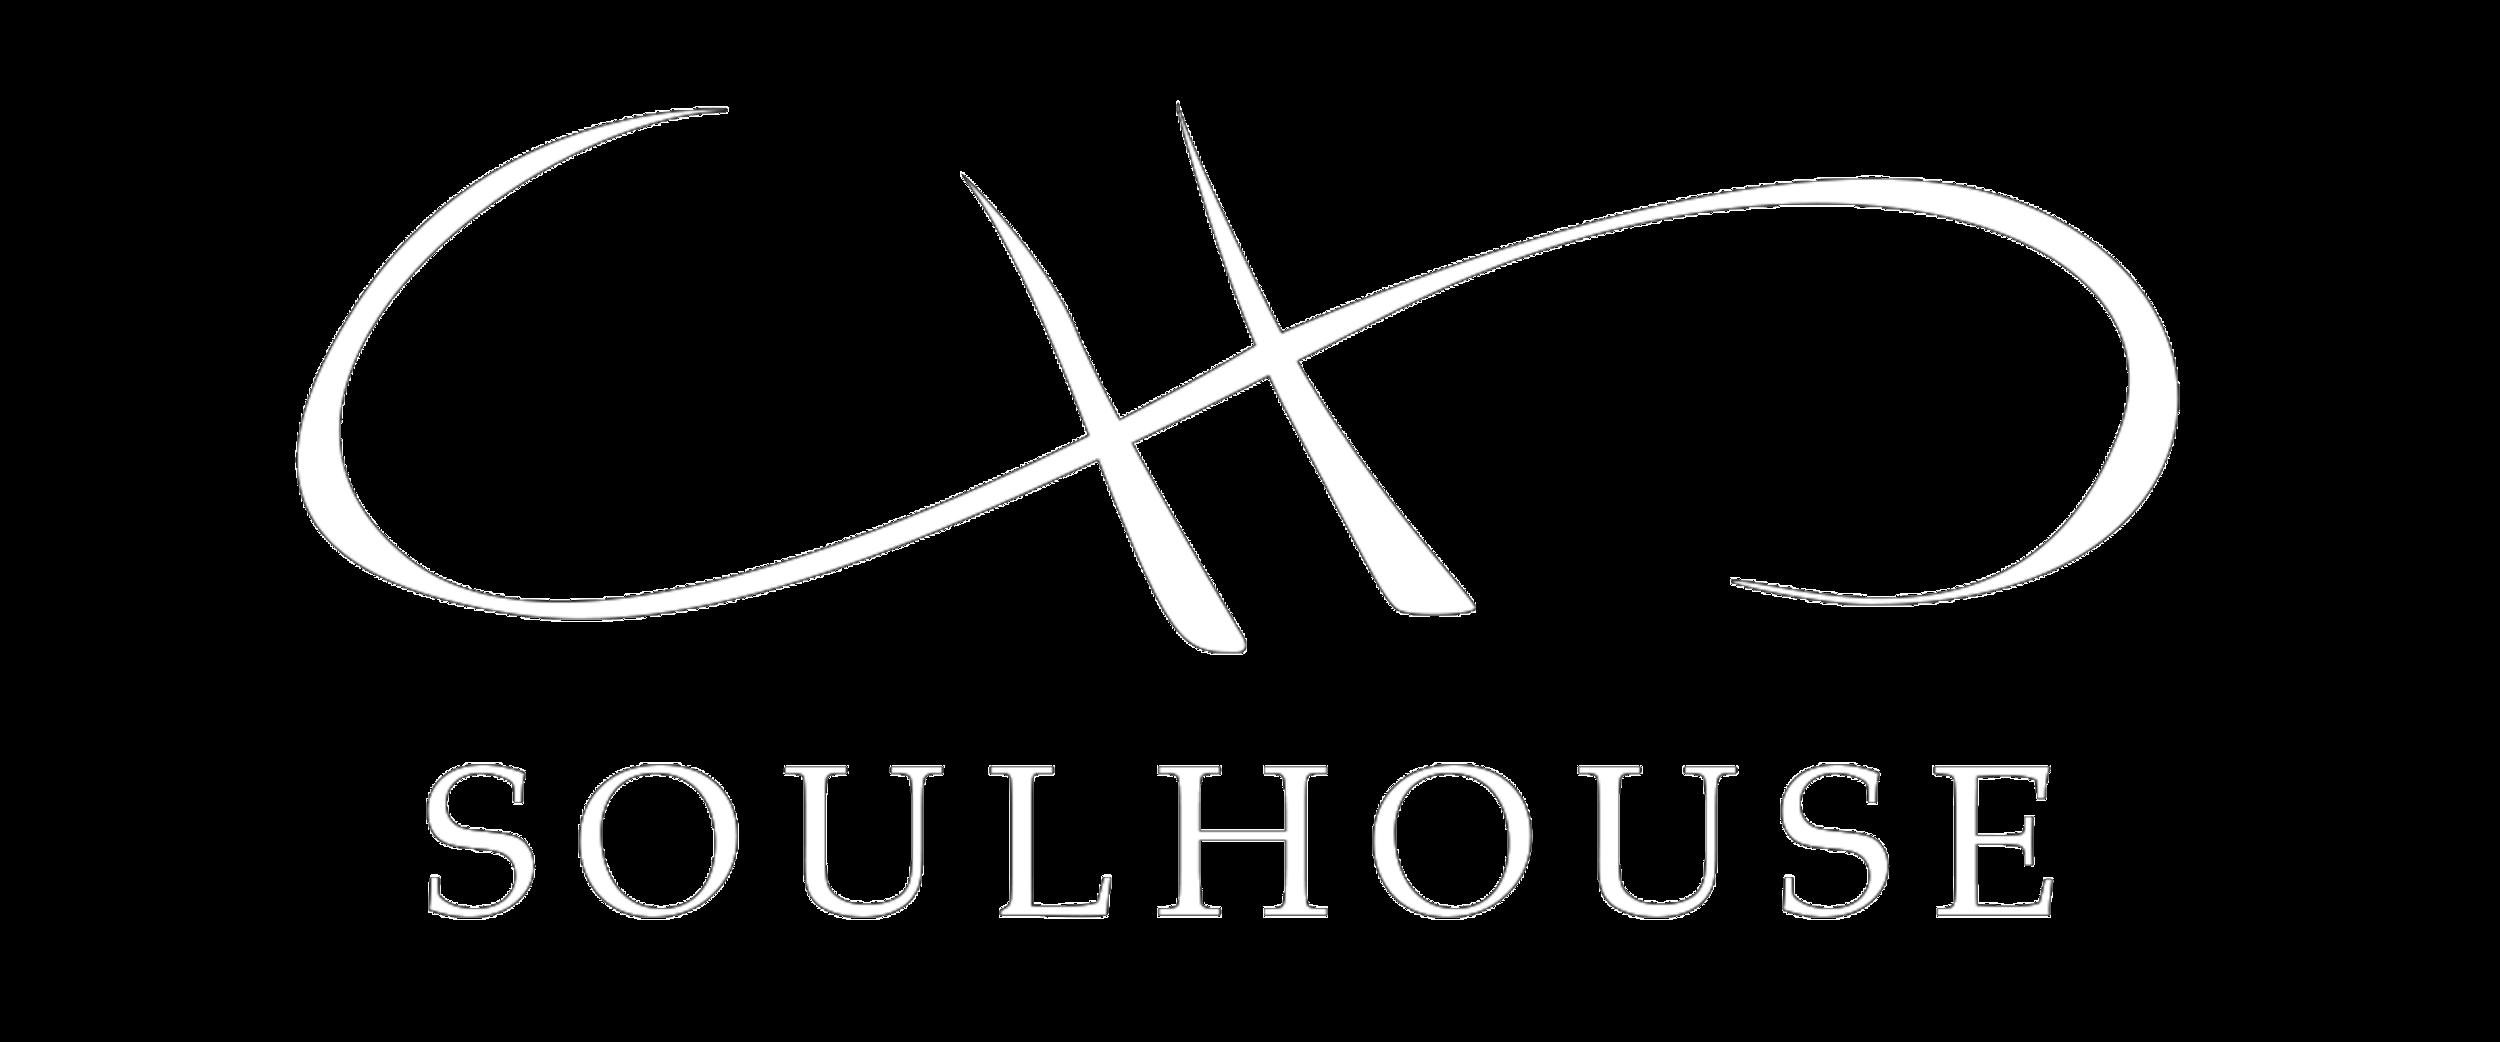 logo-soulhouse inverted.png